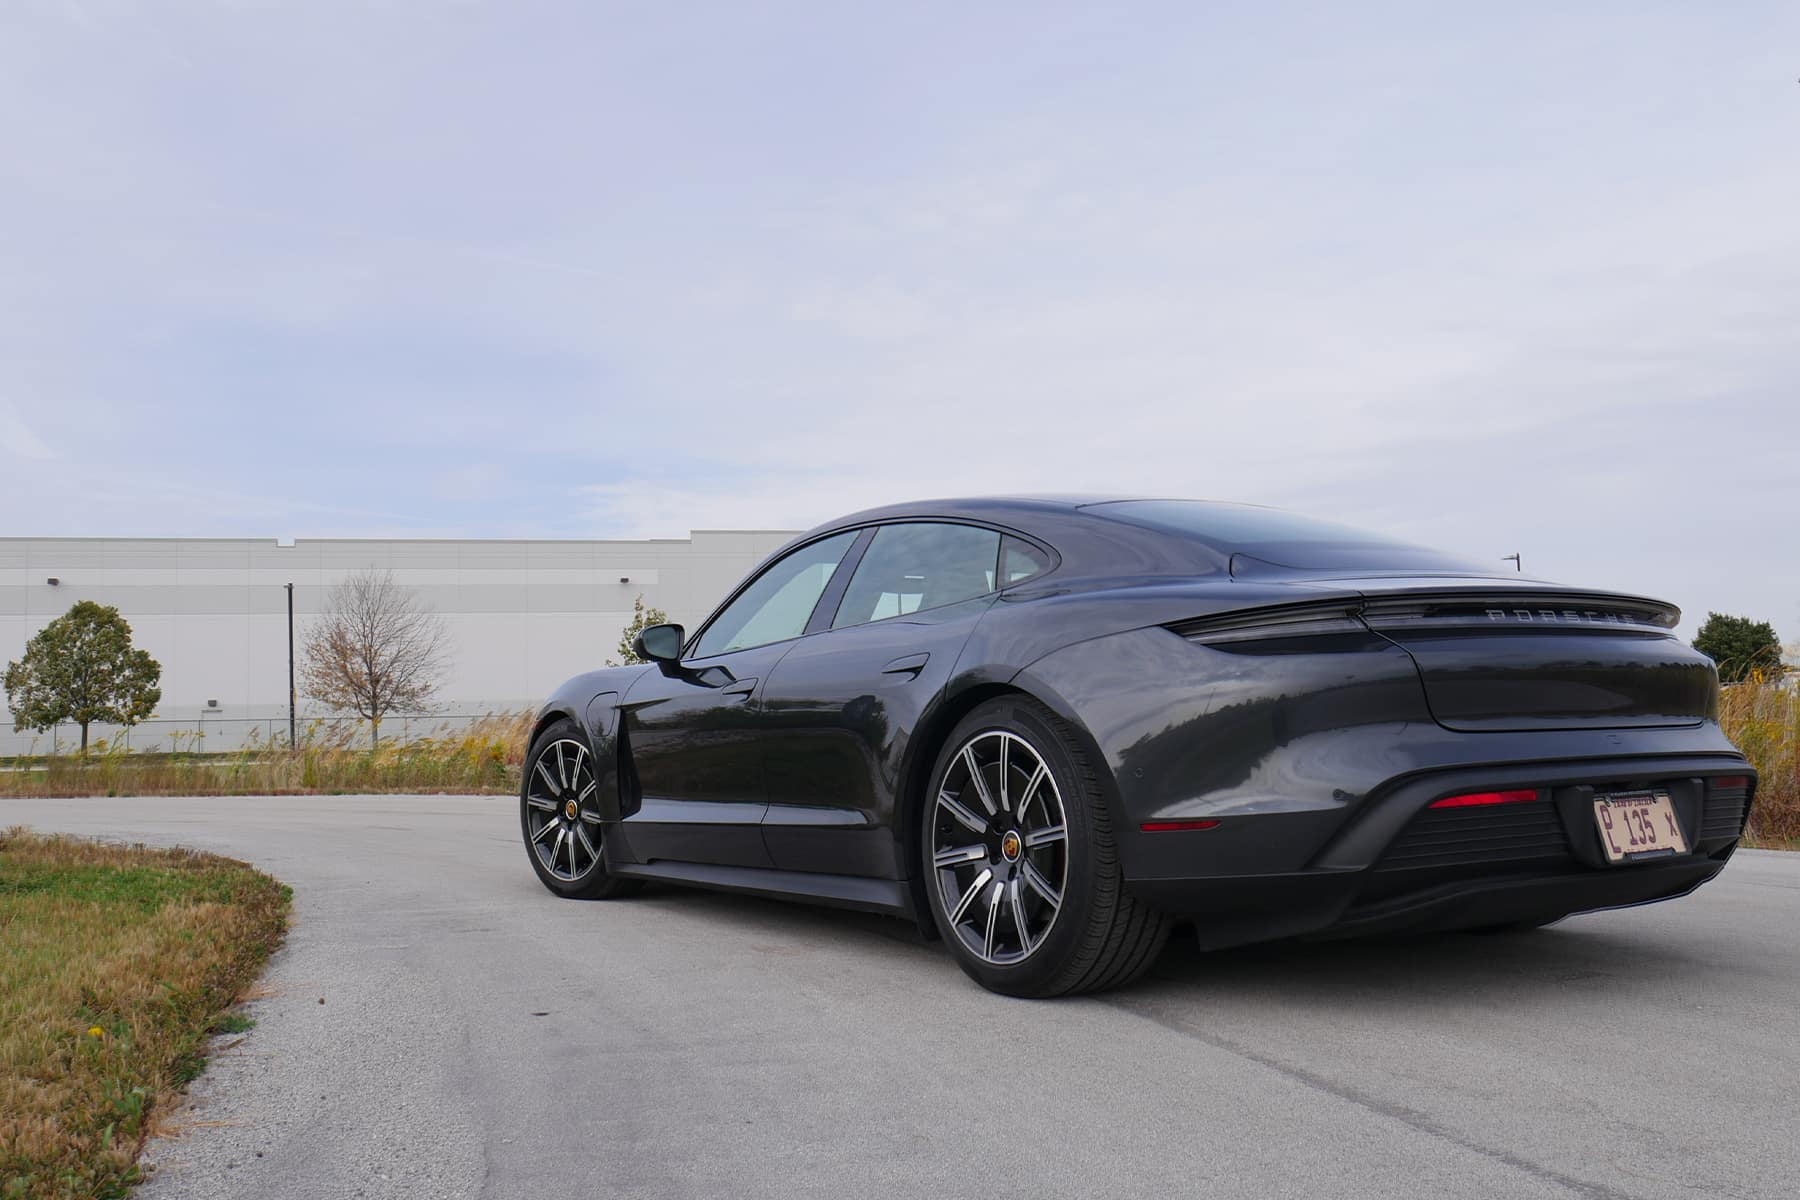 Porsche Taycan Rear Quarter